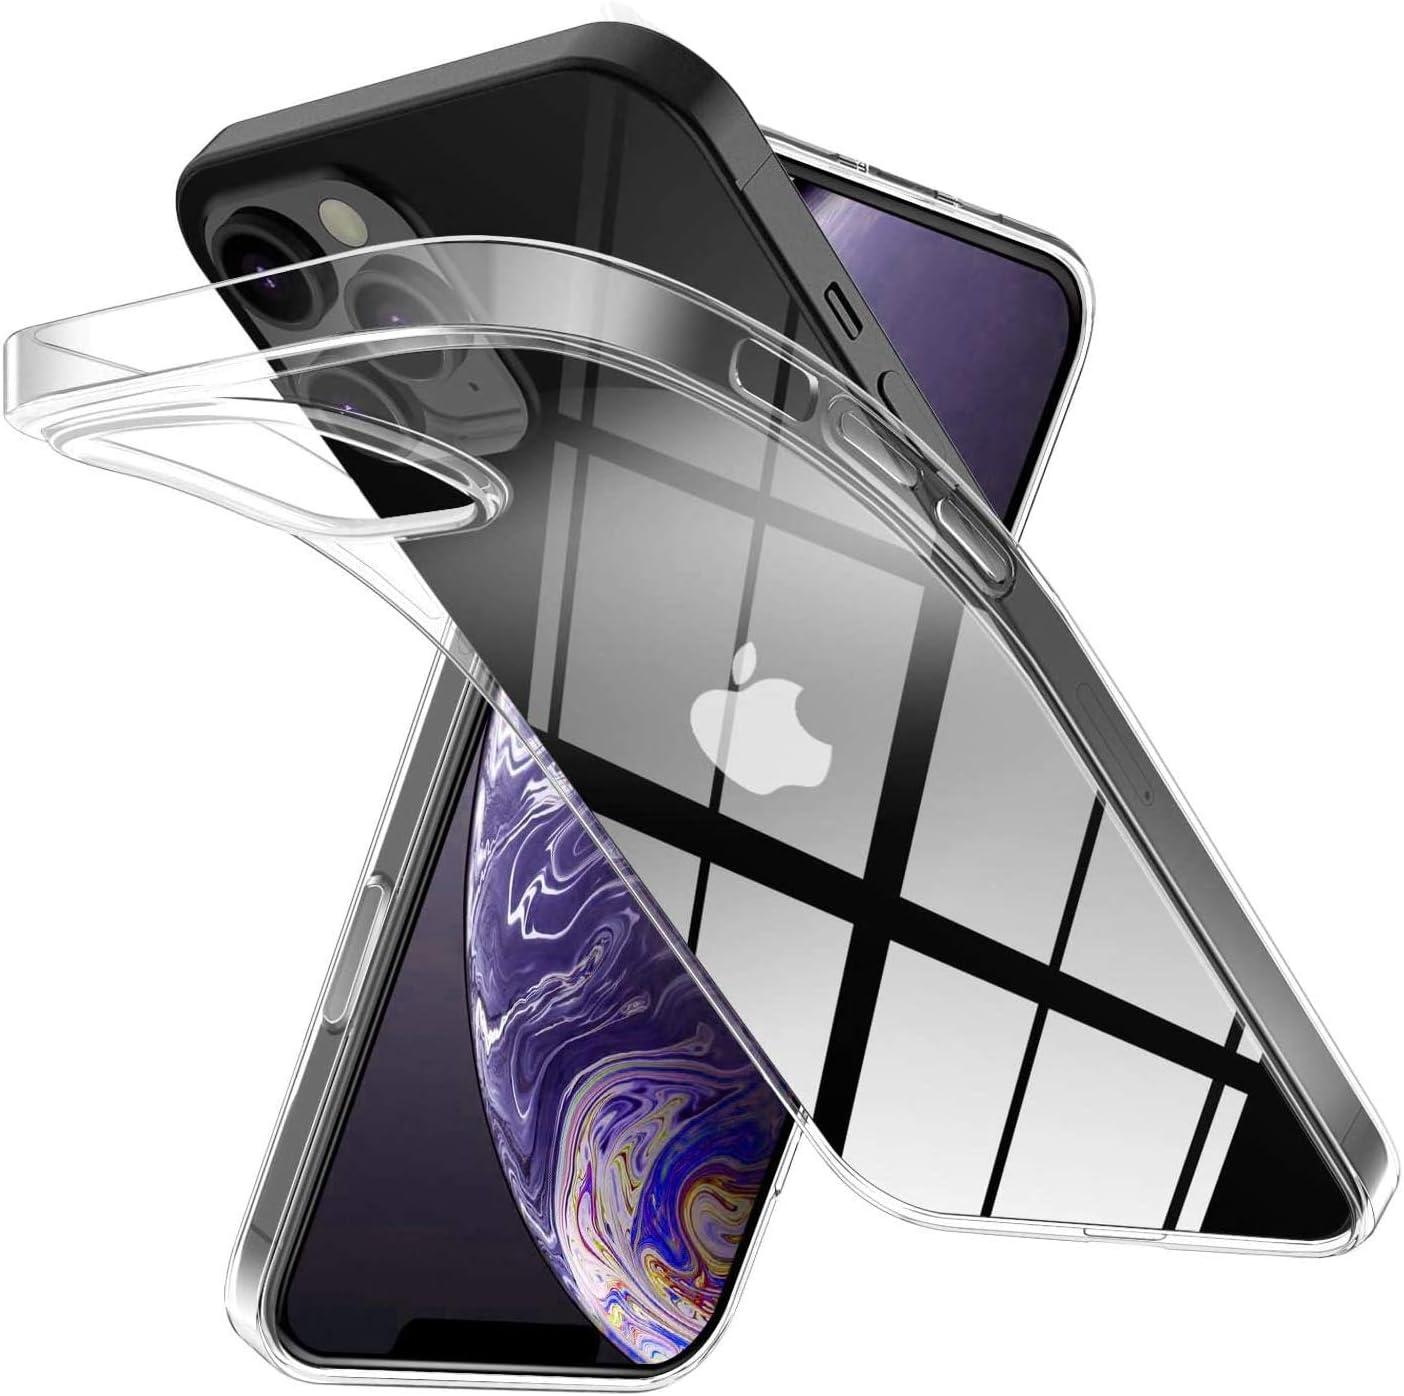 Funda de TPU transparente para iPhone 12 / iPhone 12 Pro.